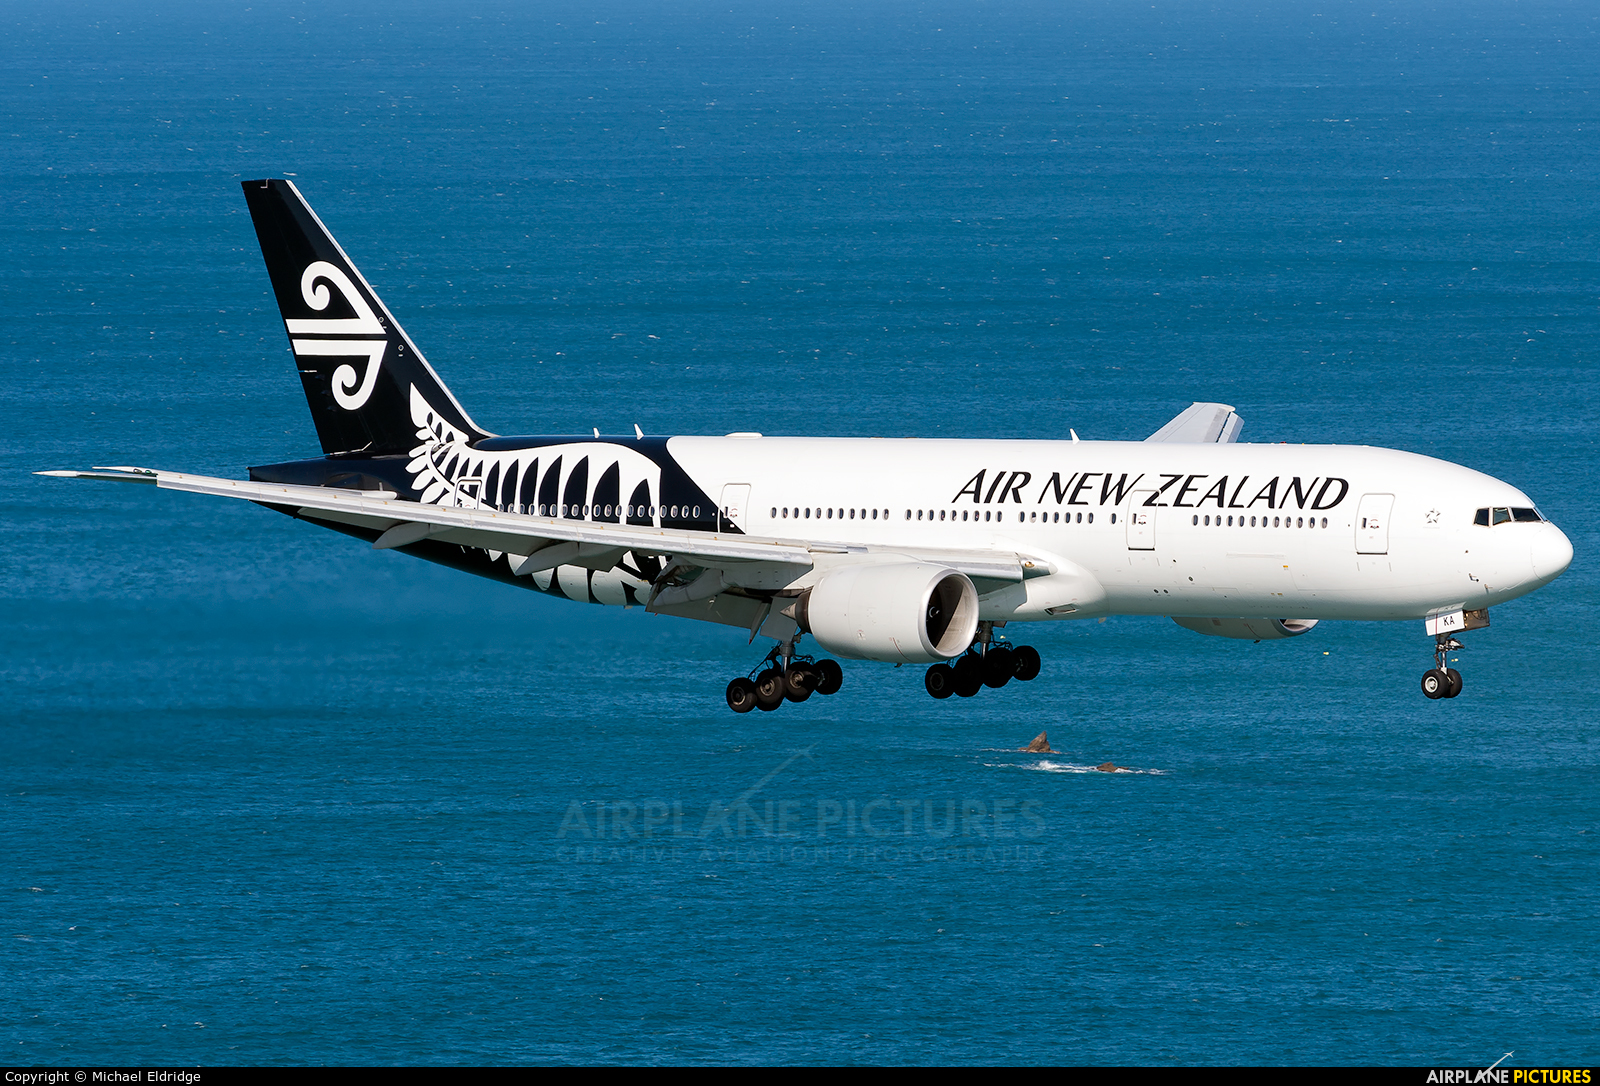 Air New Zealand ZK-OKA aircraft at Wellington Intl